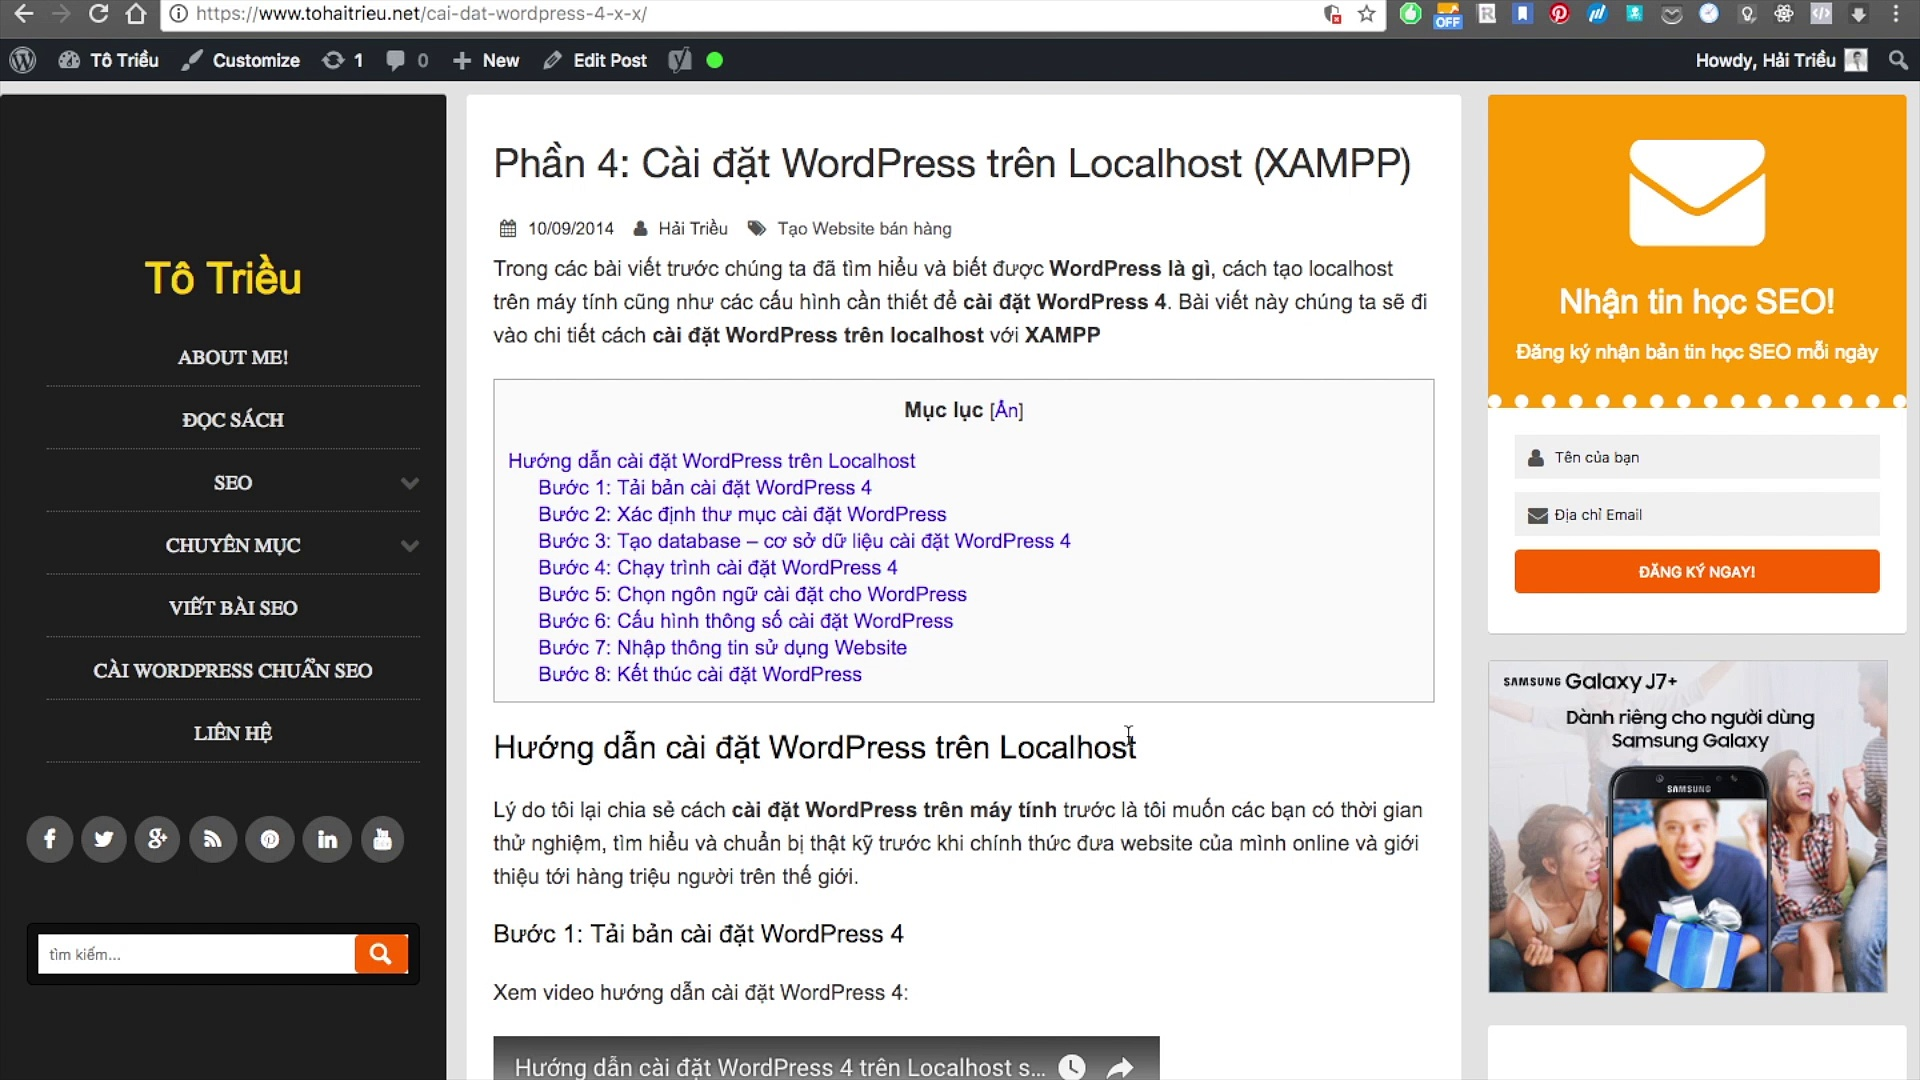 Cài WordPress trên Localhost với XAMPP | Học WordPress